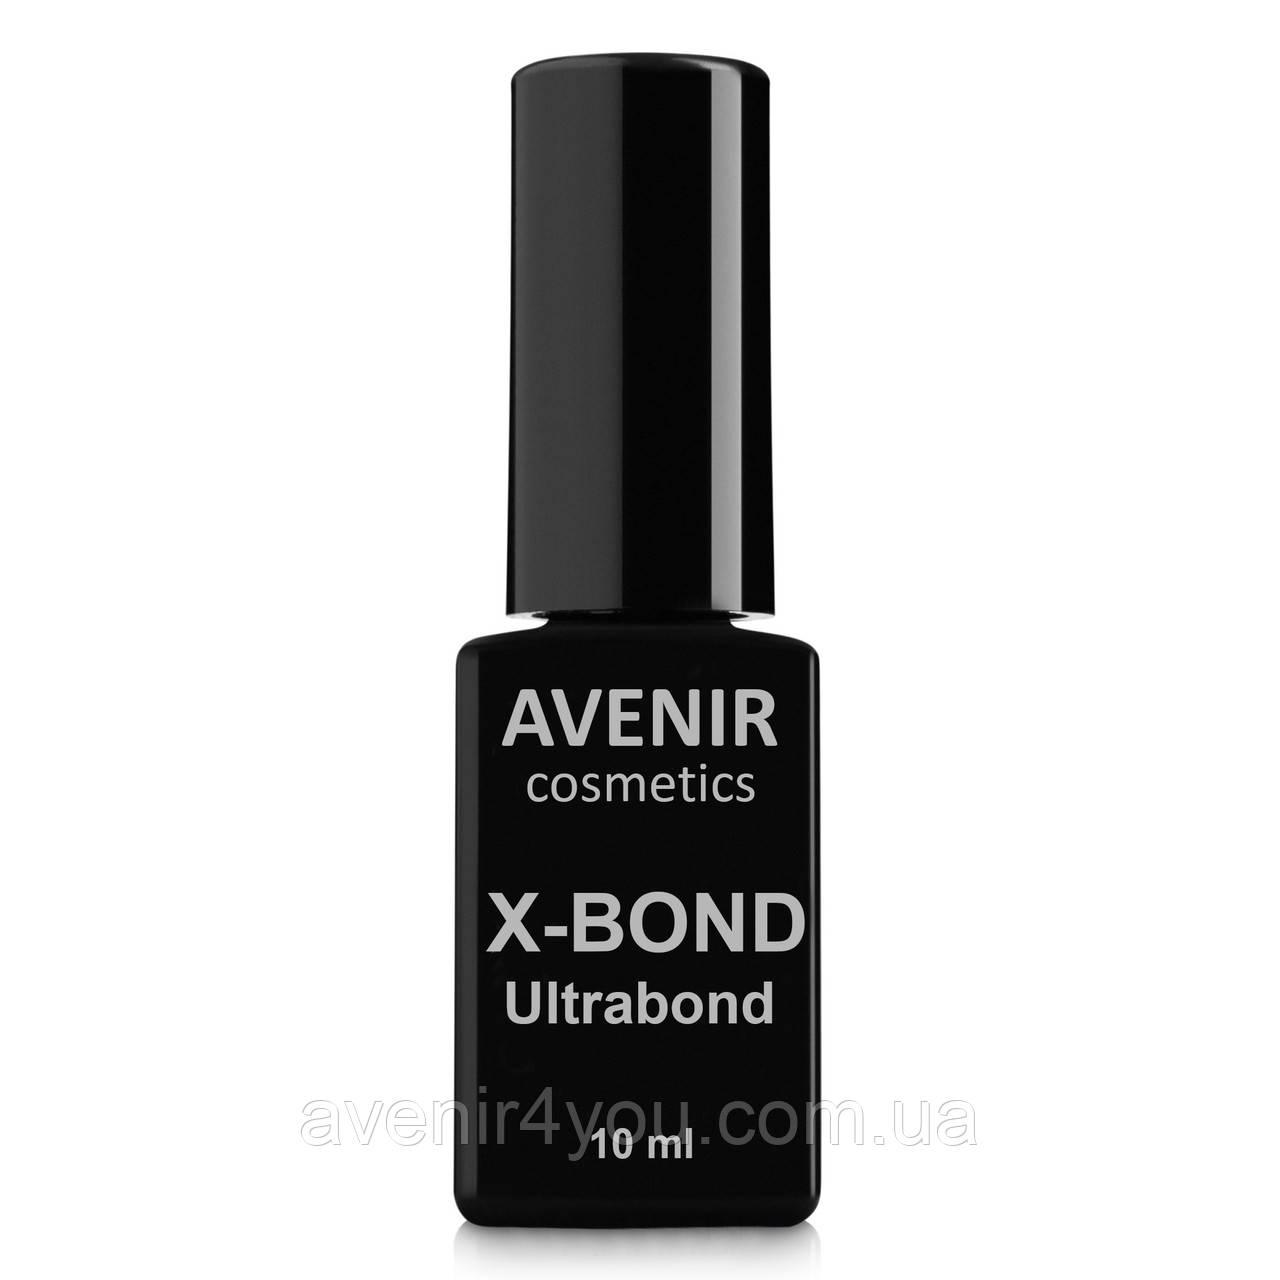 Ультрабонд X-BOND Avenir Cosmetics 10 мл